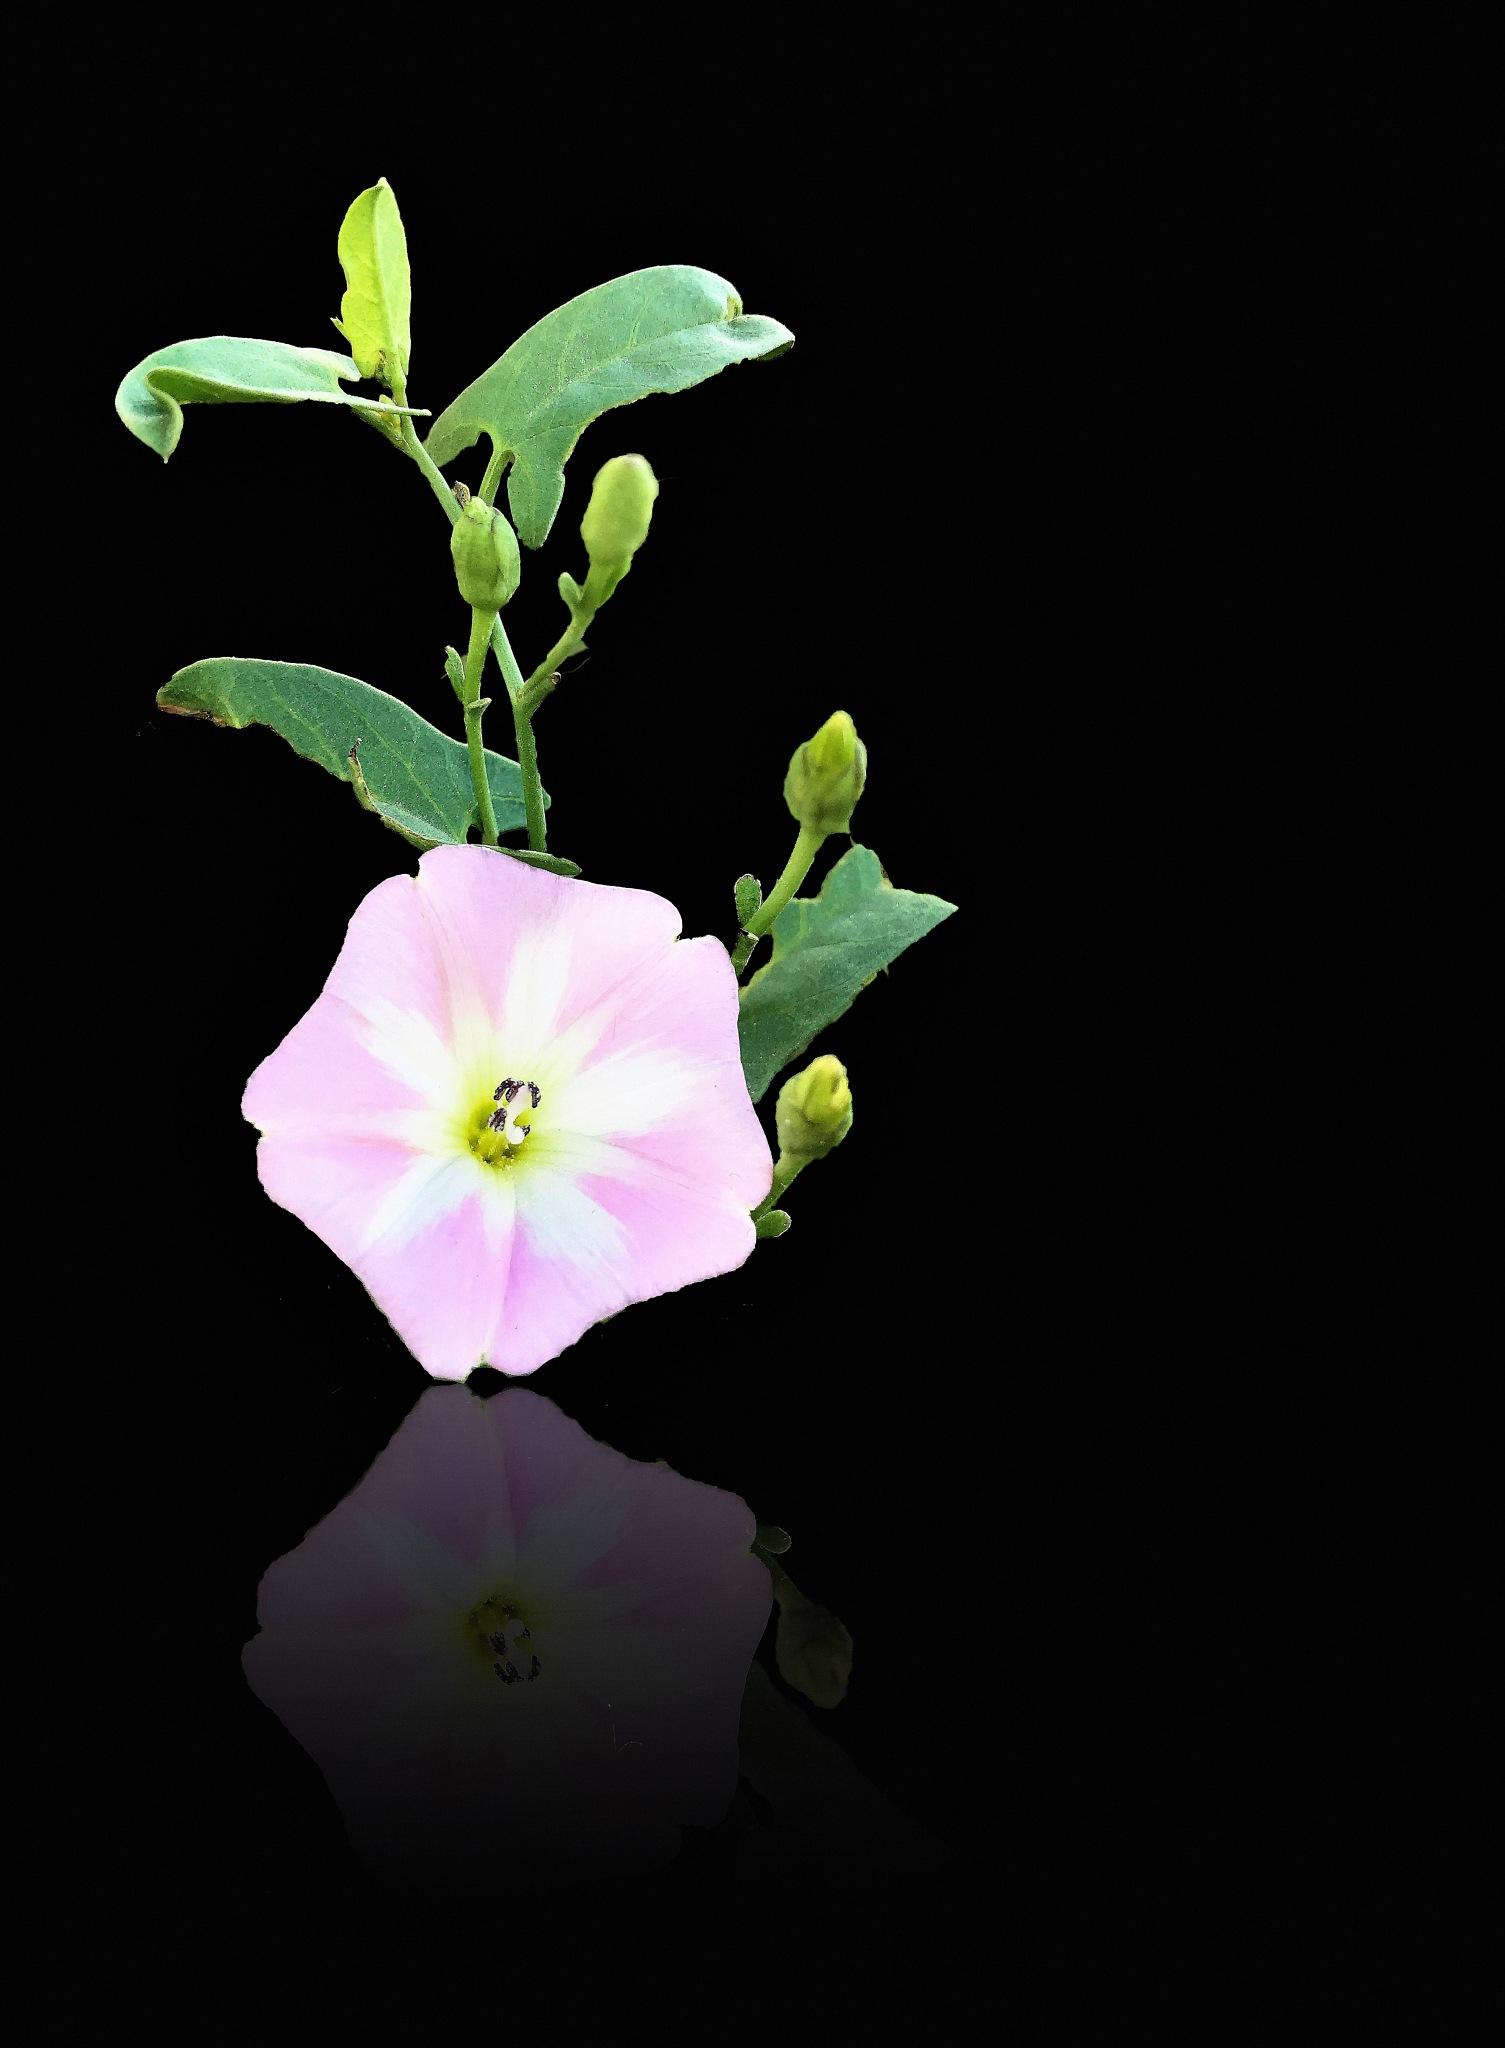 pink,green,black by osama ali mhmoud